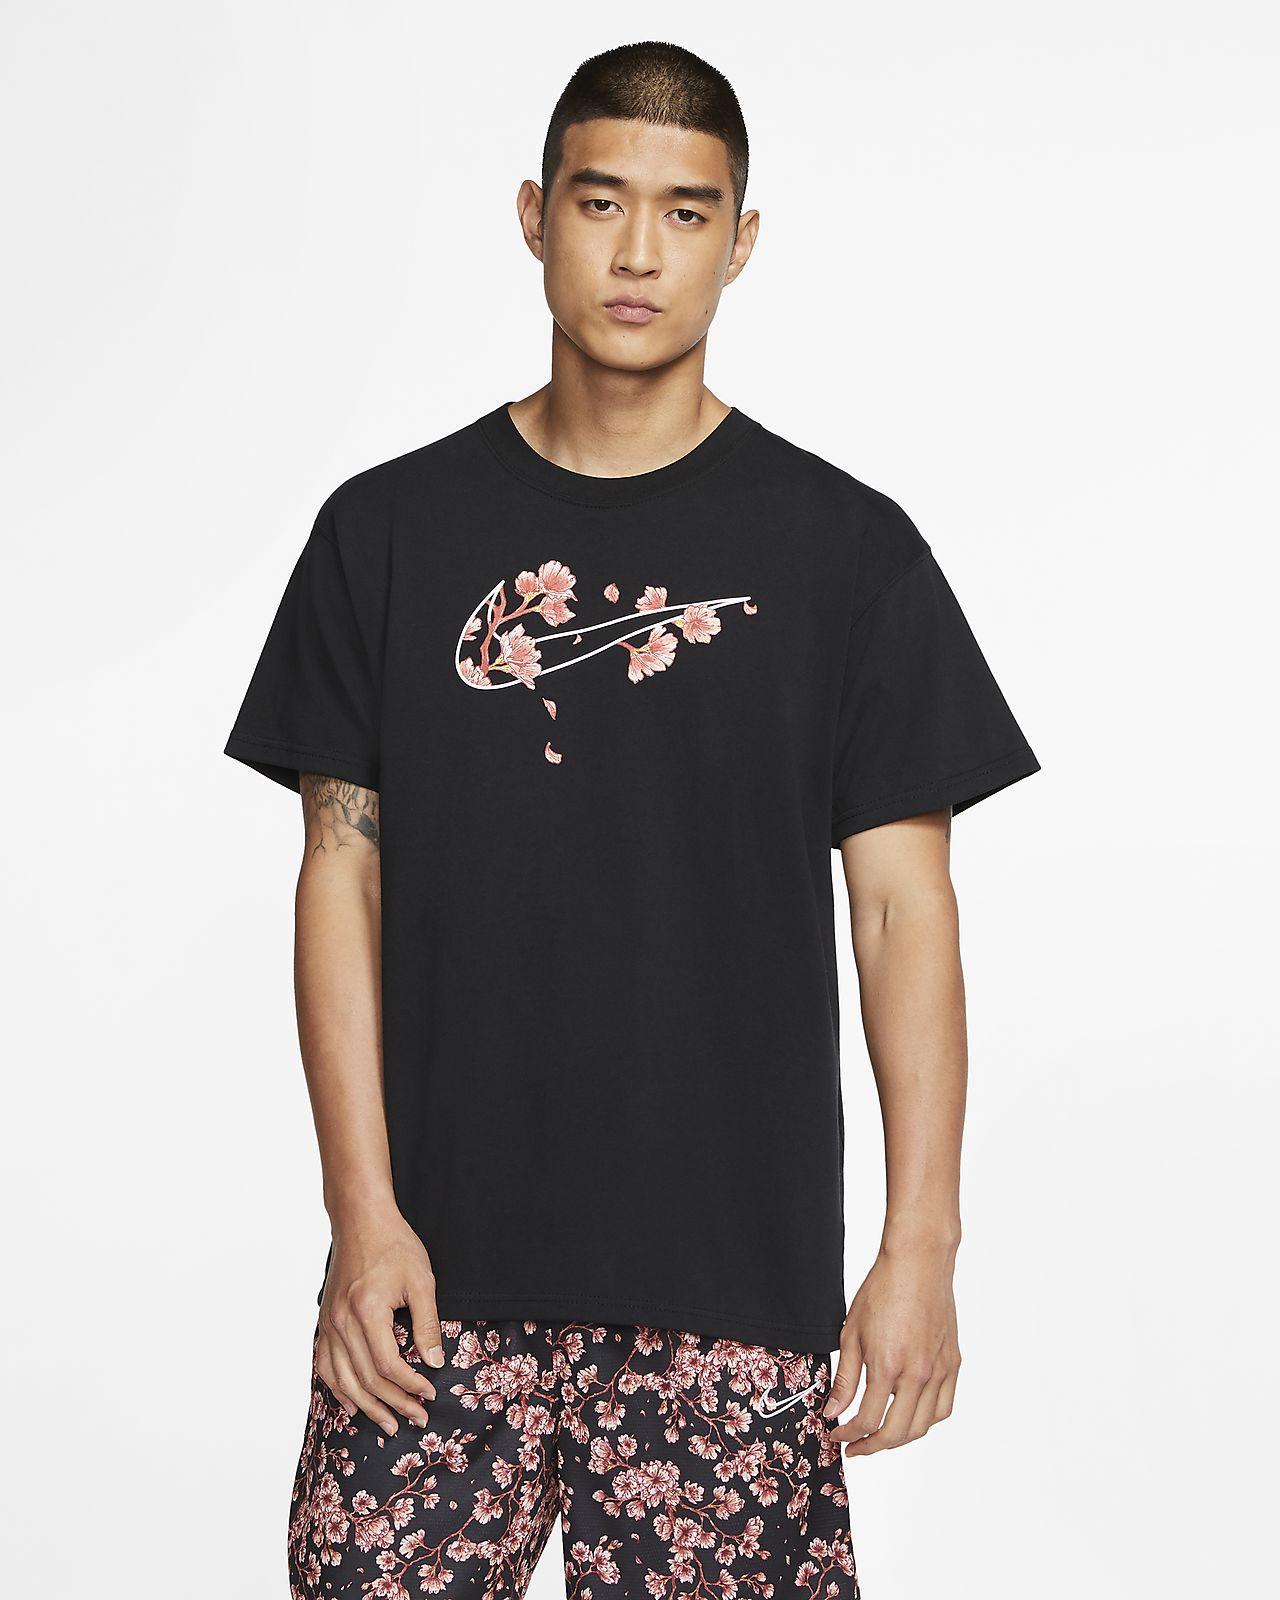 Nike Men's Basketball T Shirt